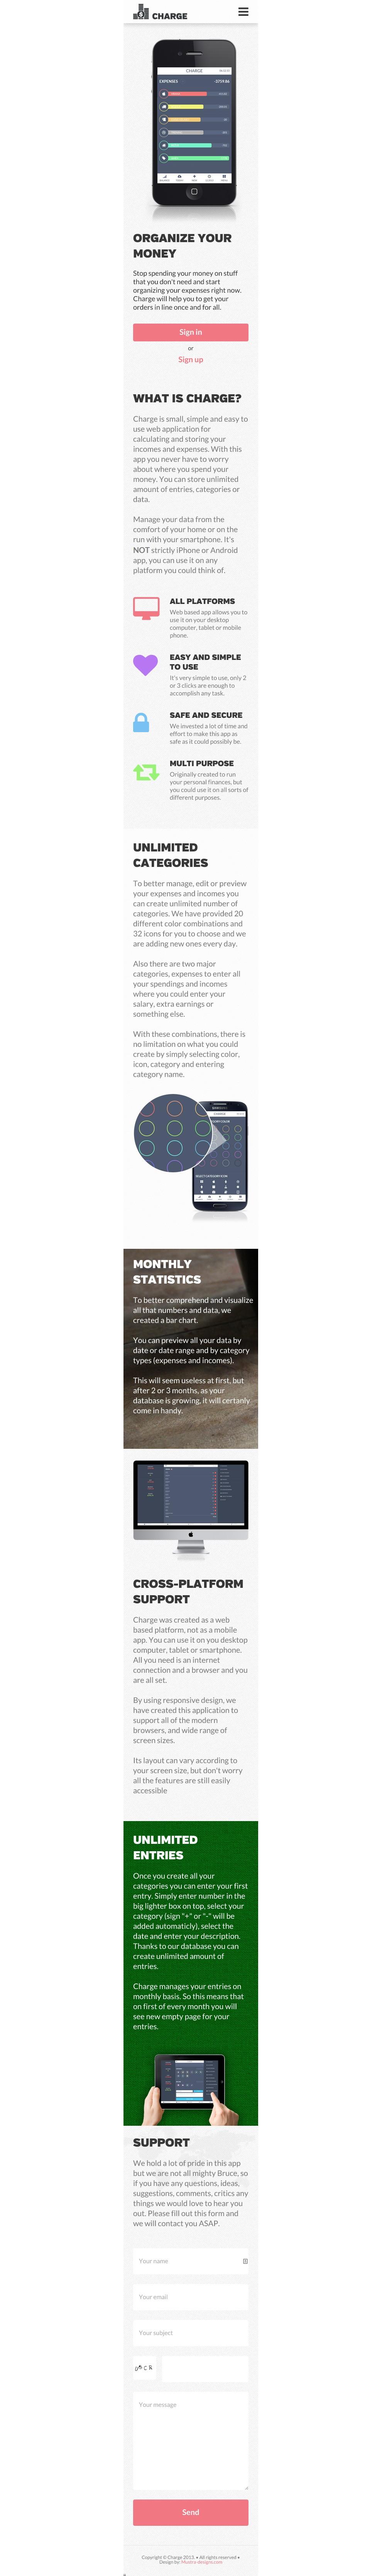 Responsive mobile page